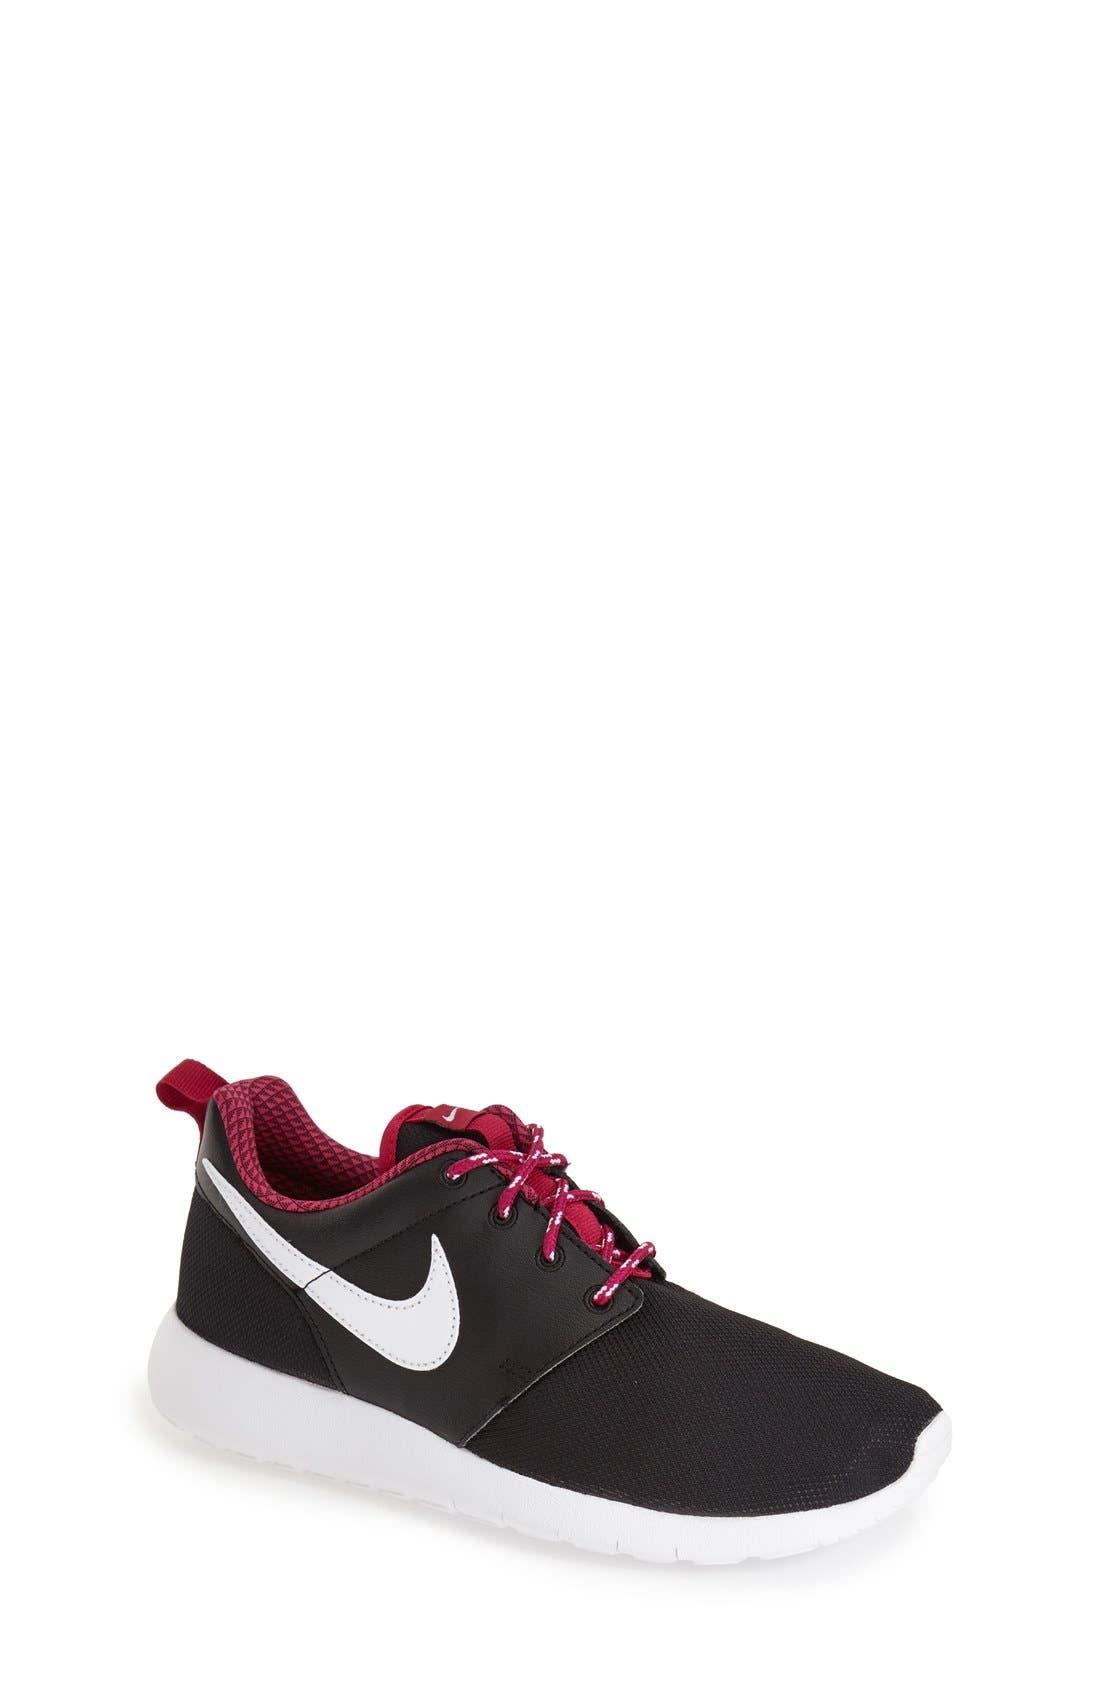 'Roshe Run' Athletic Shoe,                             Main thumbnail 18, color,